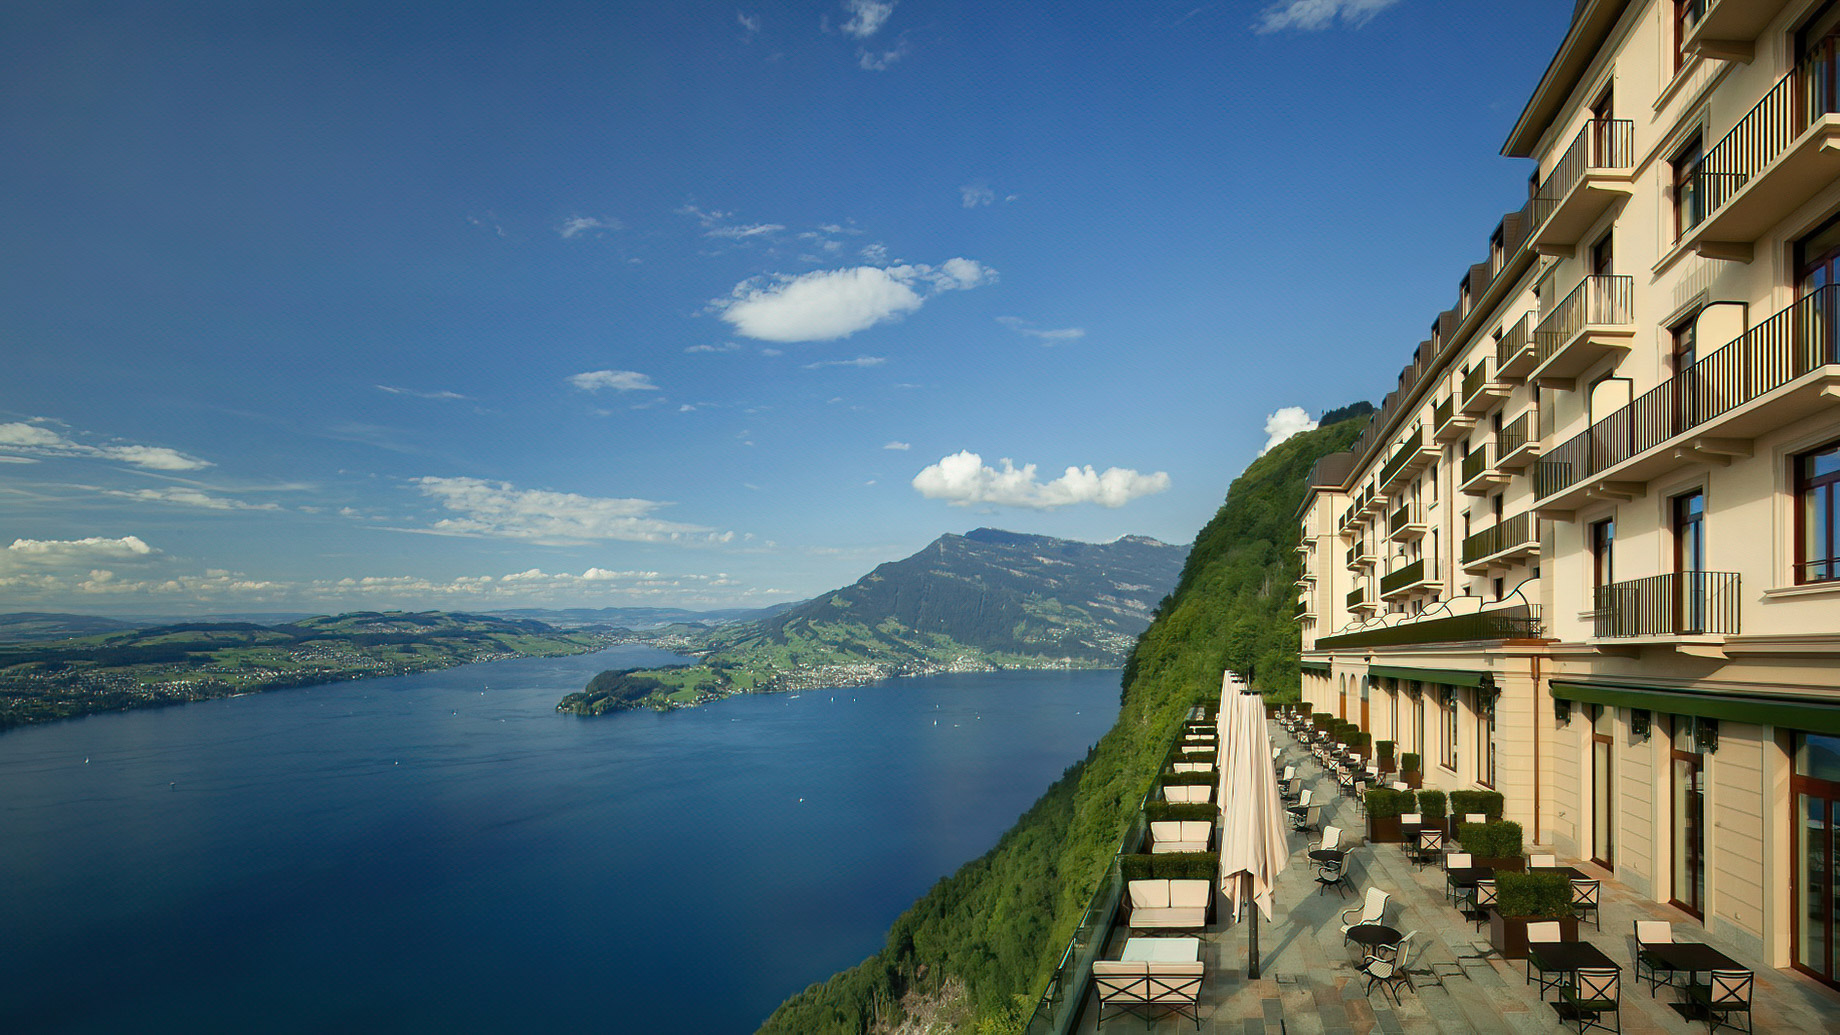 Palace Hotel - Burgenstock Hotels & Resort - Obburgen, Switzerland